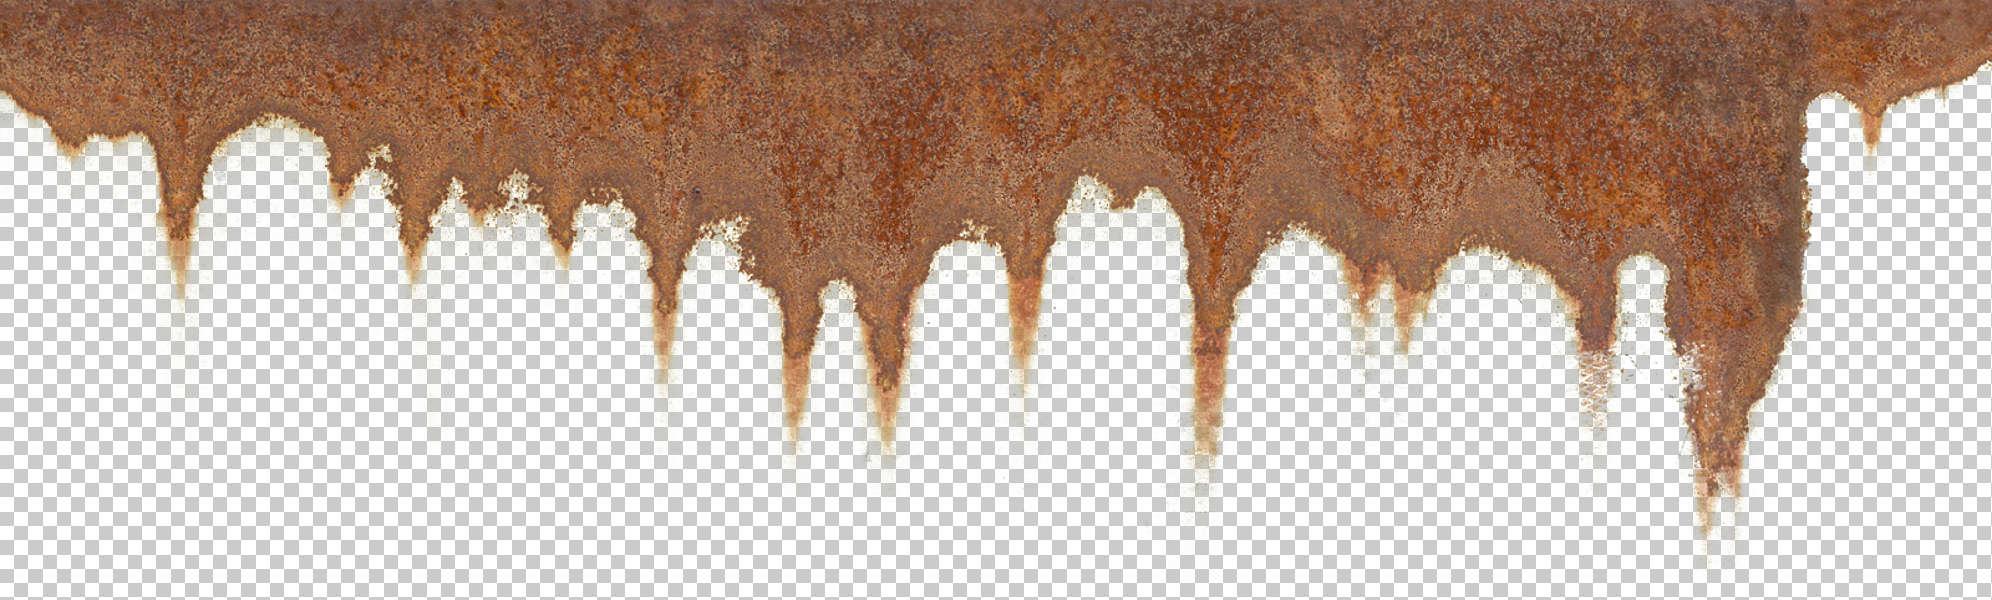 Decalleakingrusty0029 Free Background Texture Decal